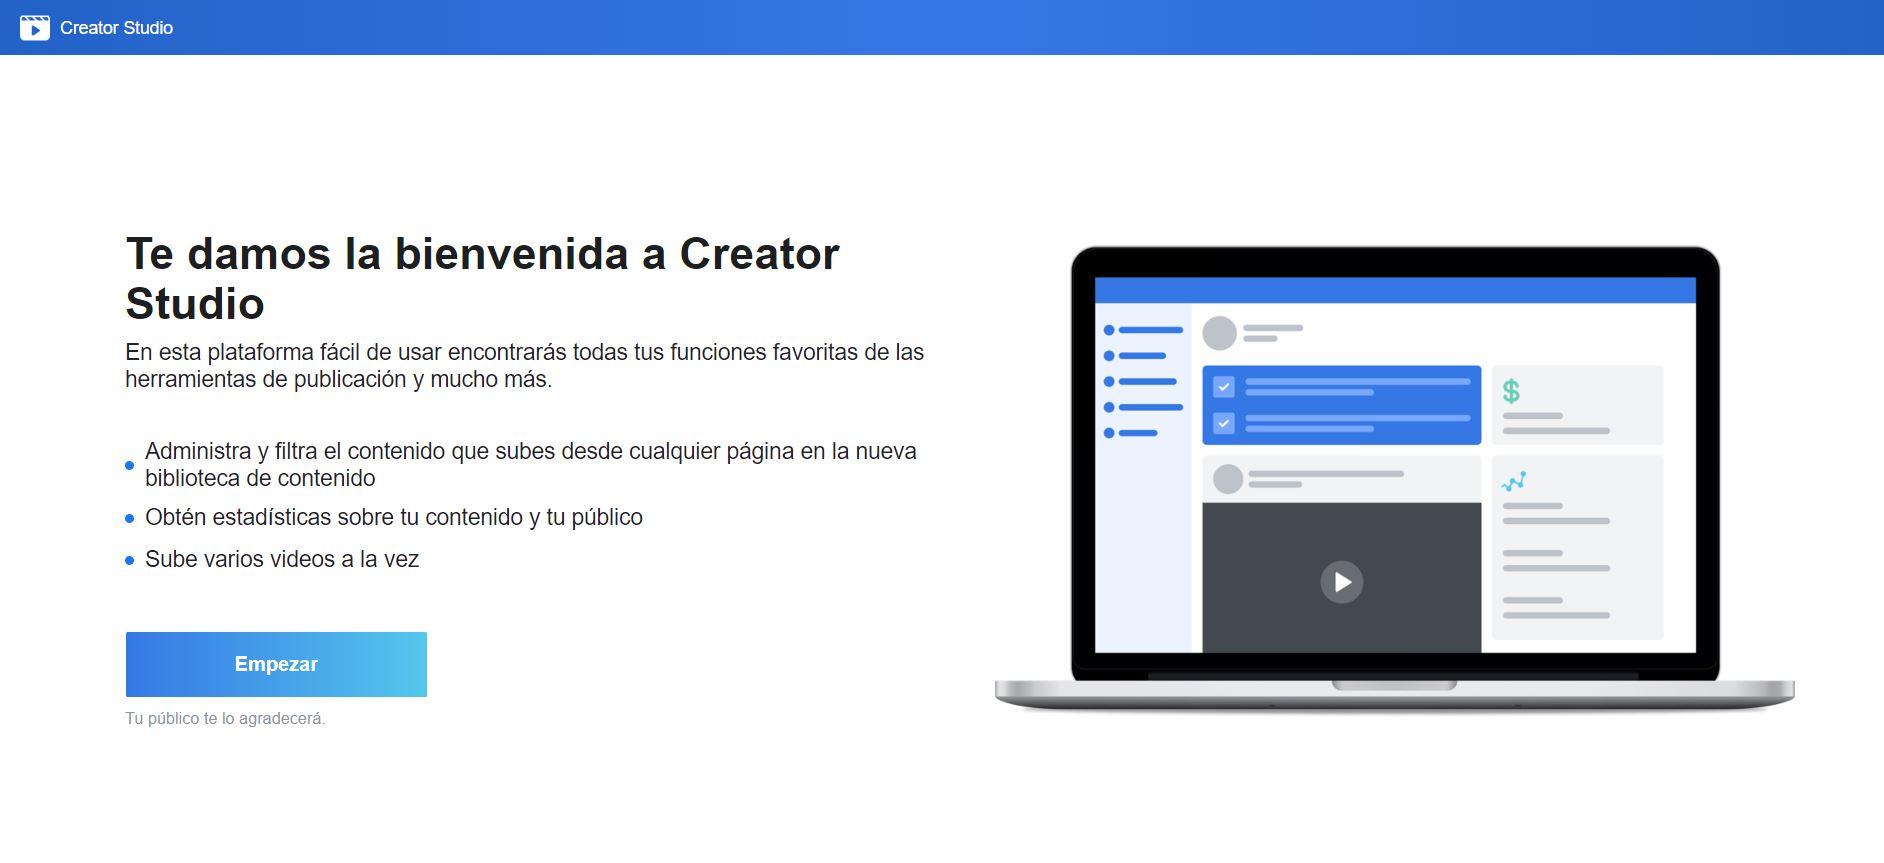 Creator Studio Facebook Instagram